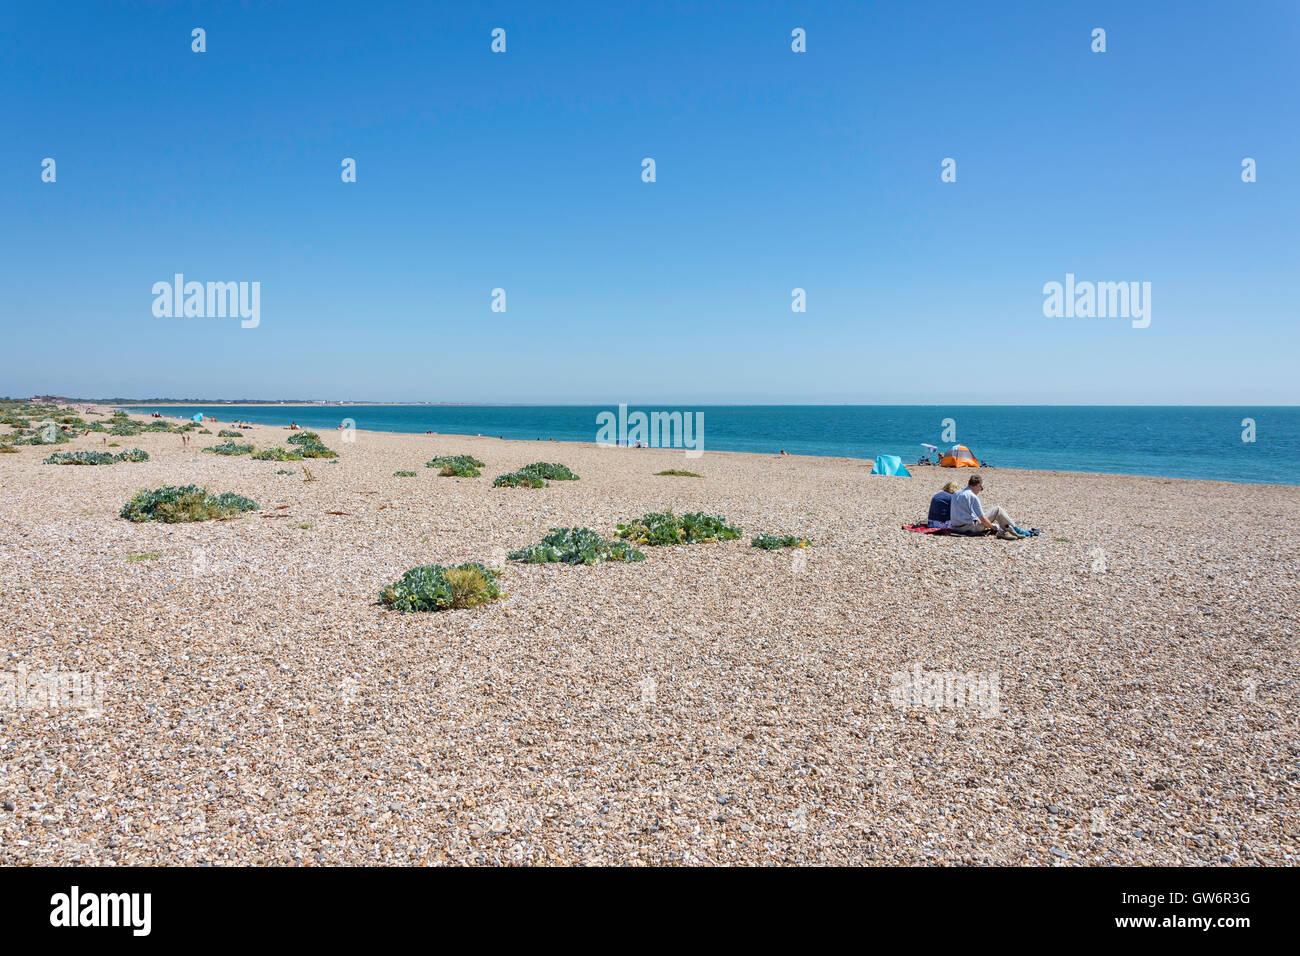 Eastney Beach, Southsea, Portsmouth, Hampshire, England, United Kingdom - Stock Image